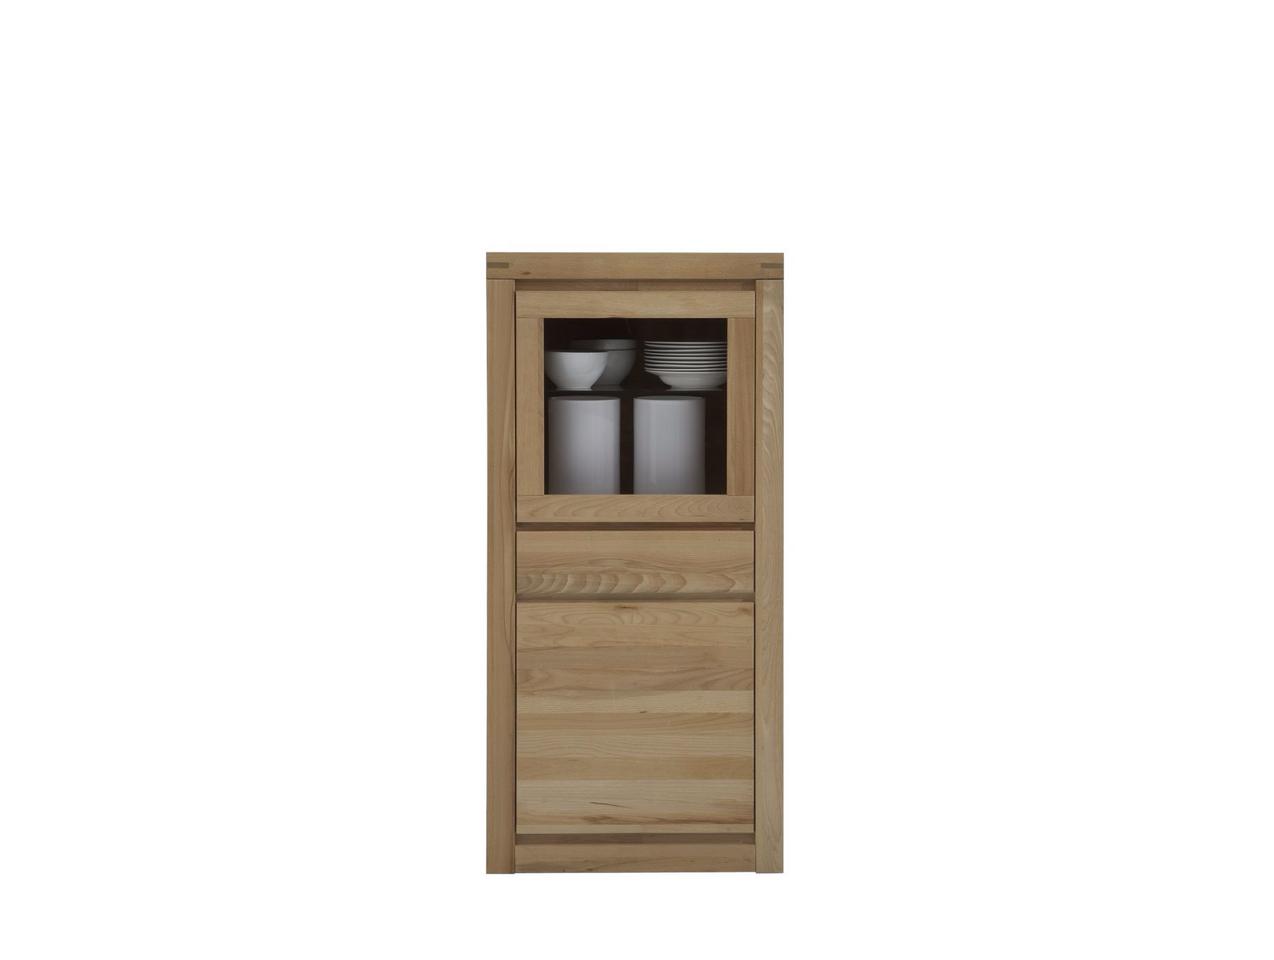 Massivholz Vitrine Delft 1-türig klein